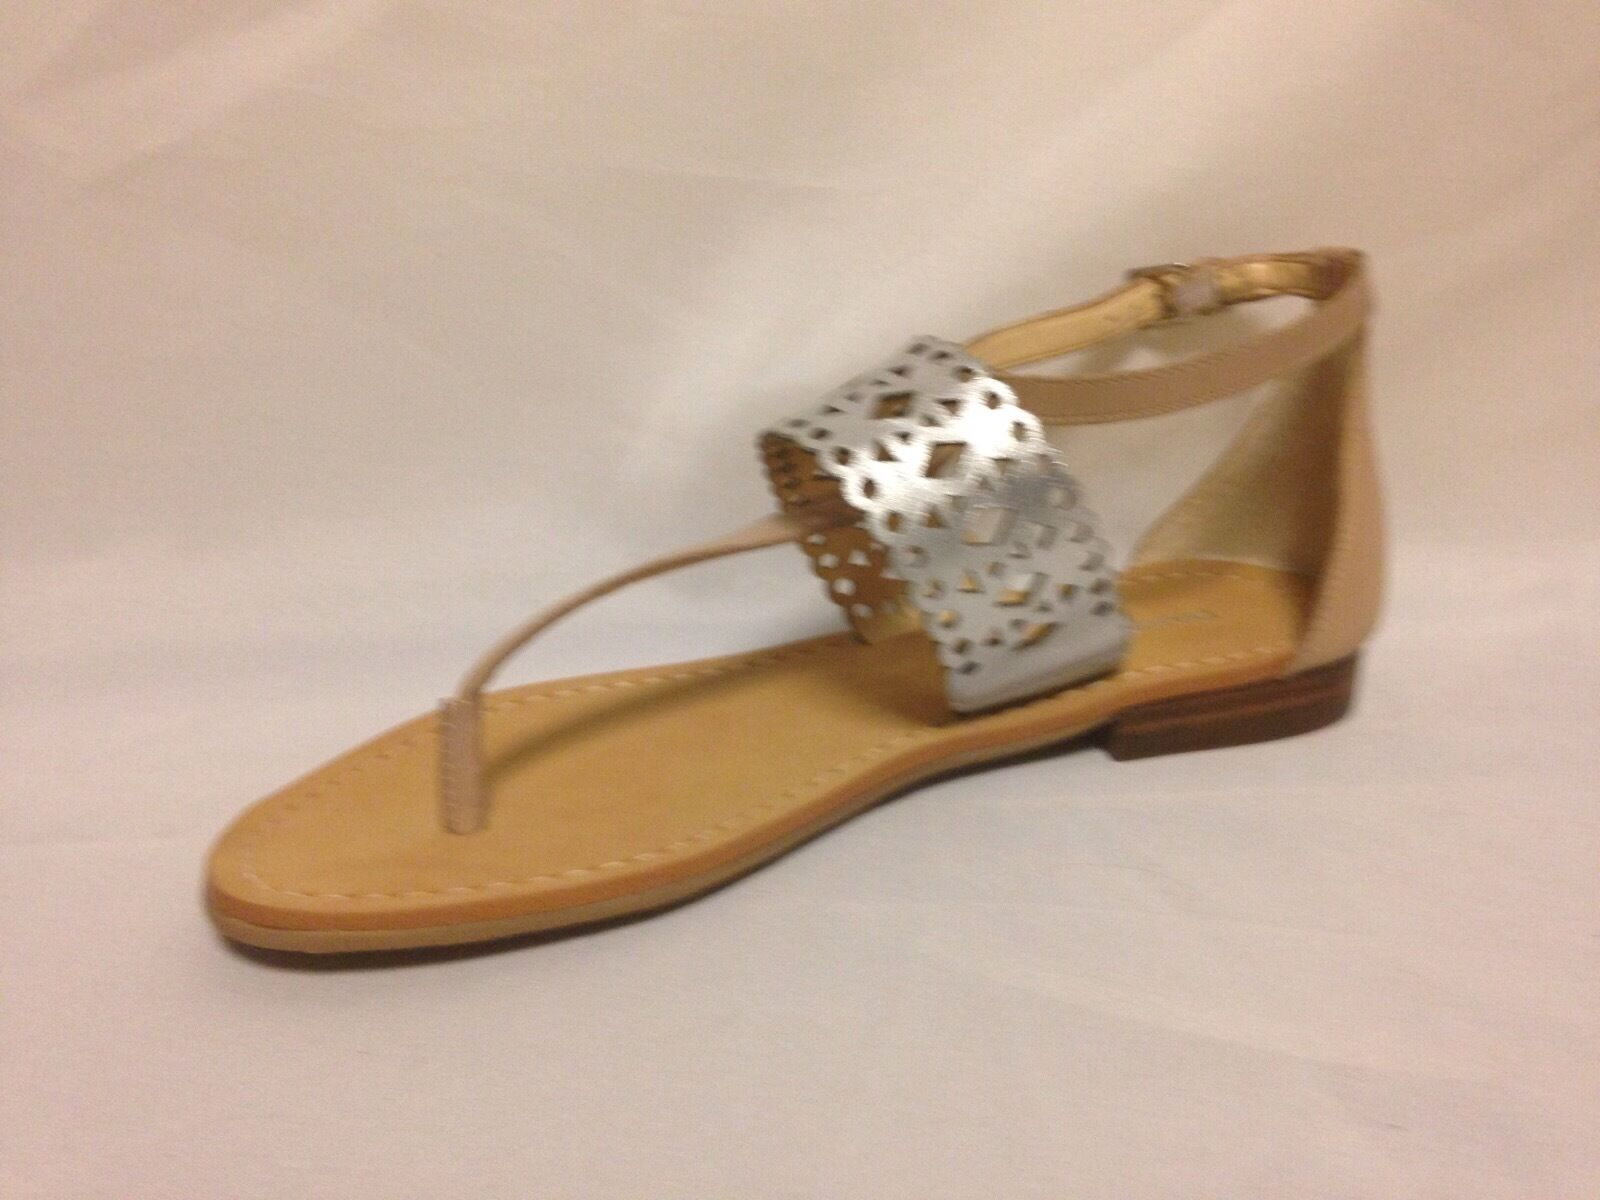 Ivanka Trump Pili Flat Sandale 8.5 M New Medium Natural Leder  New M w/Box 74fecc